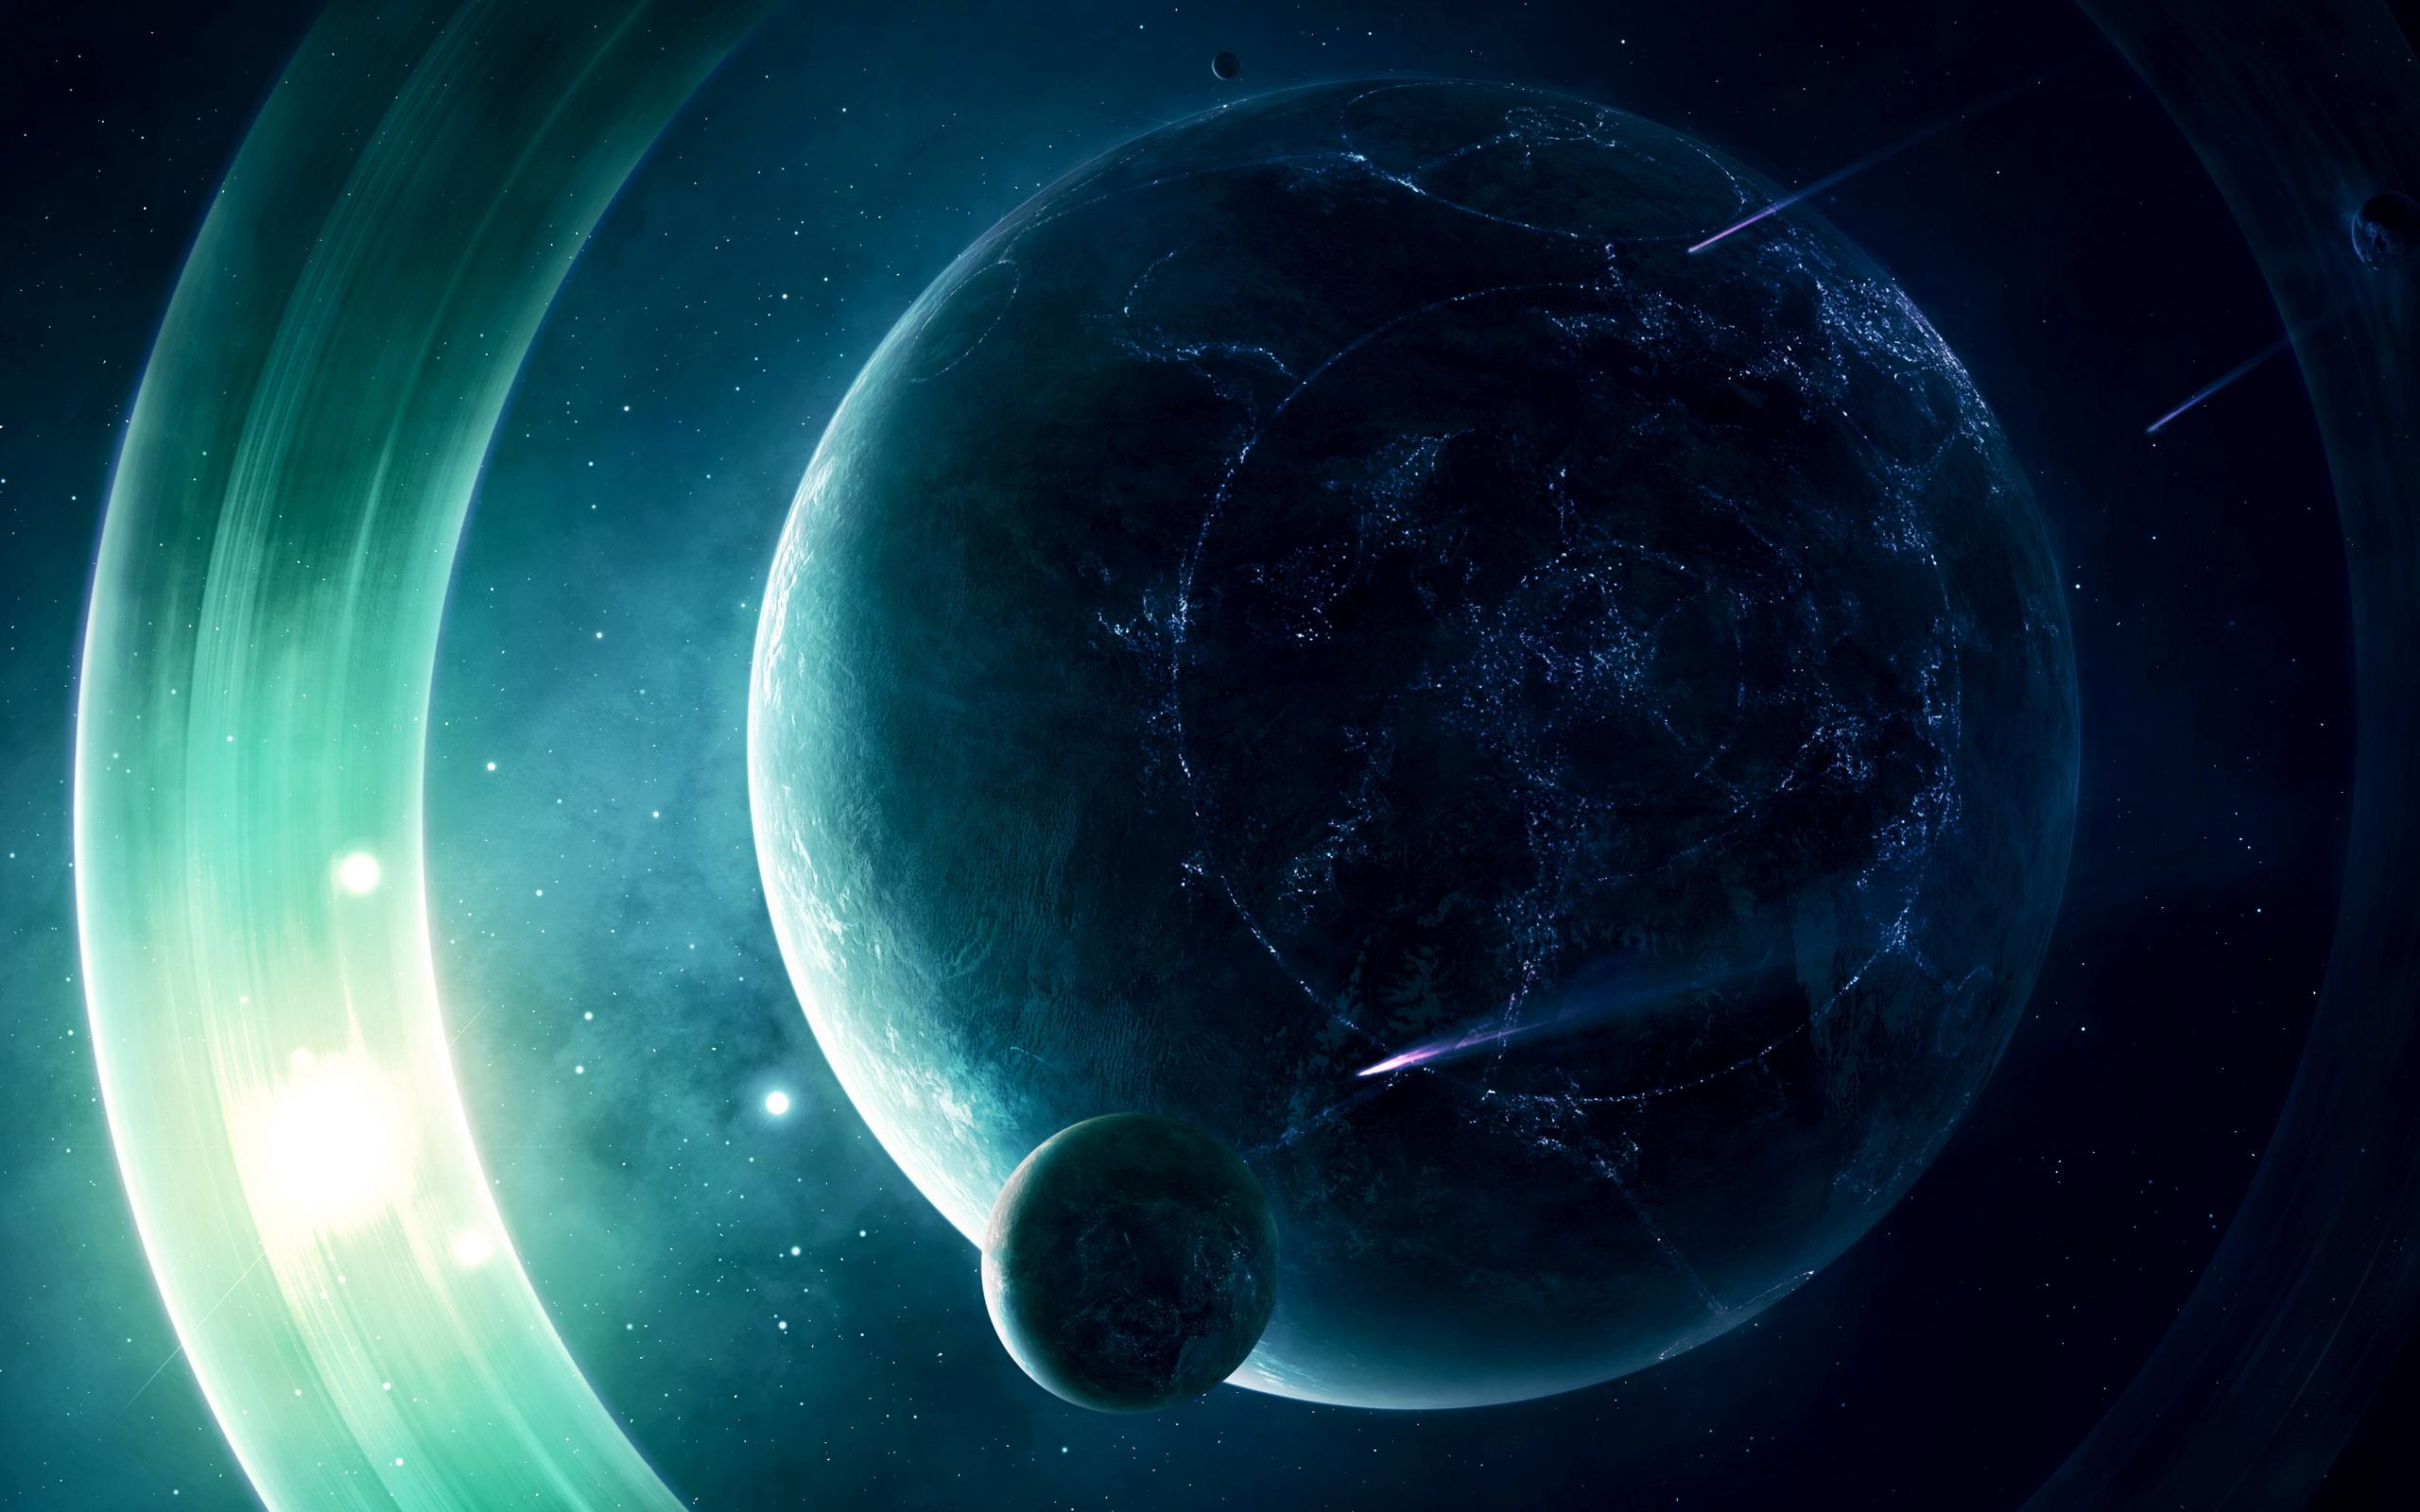 hd neptune planet rings - photo #31